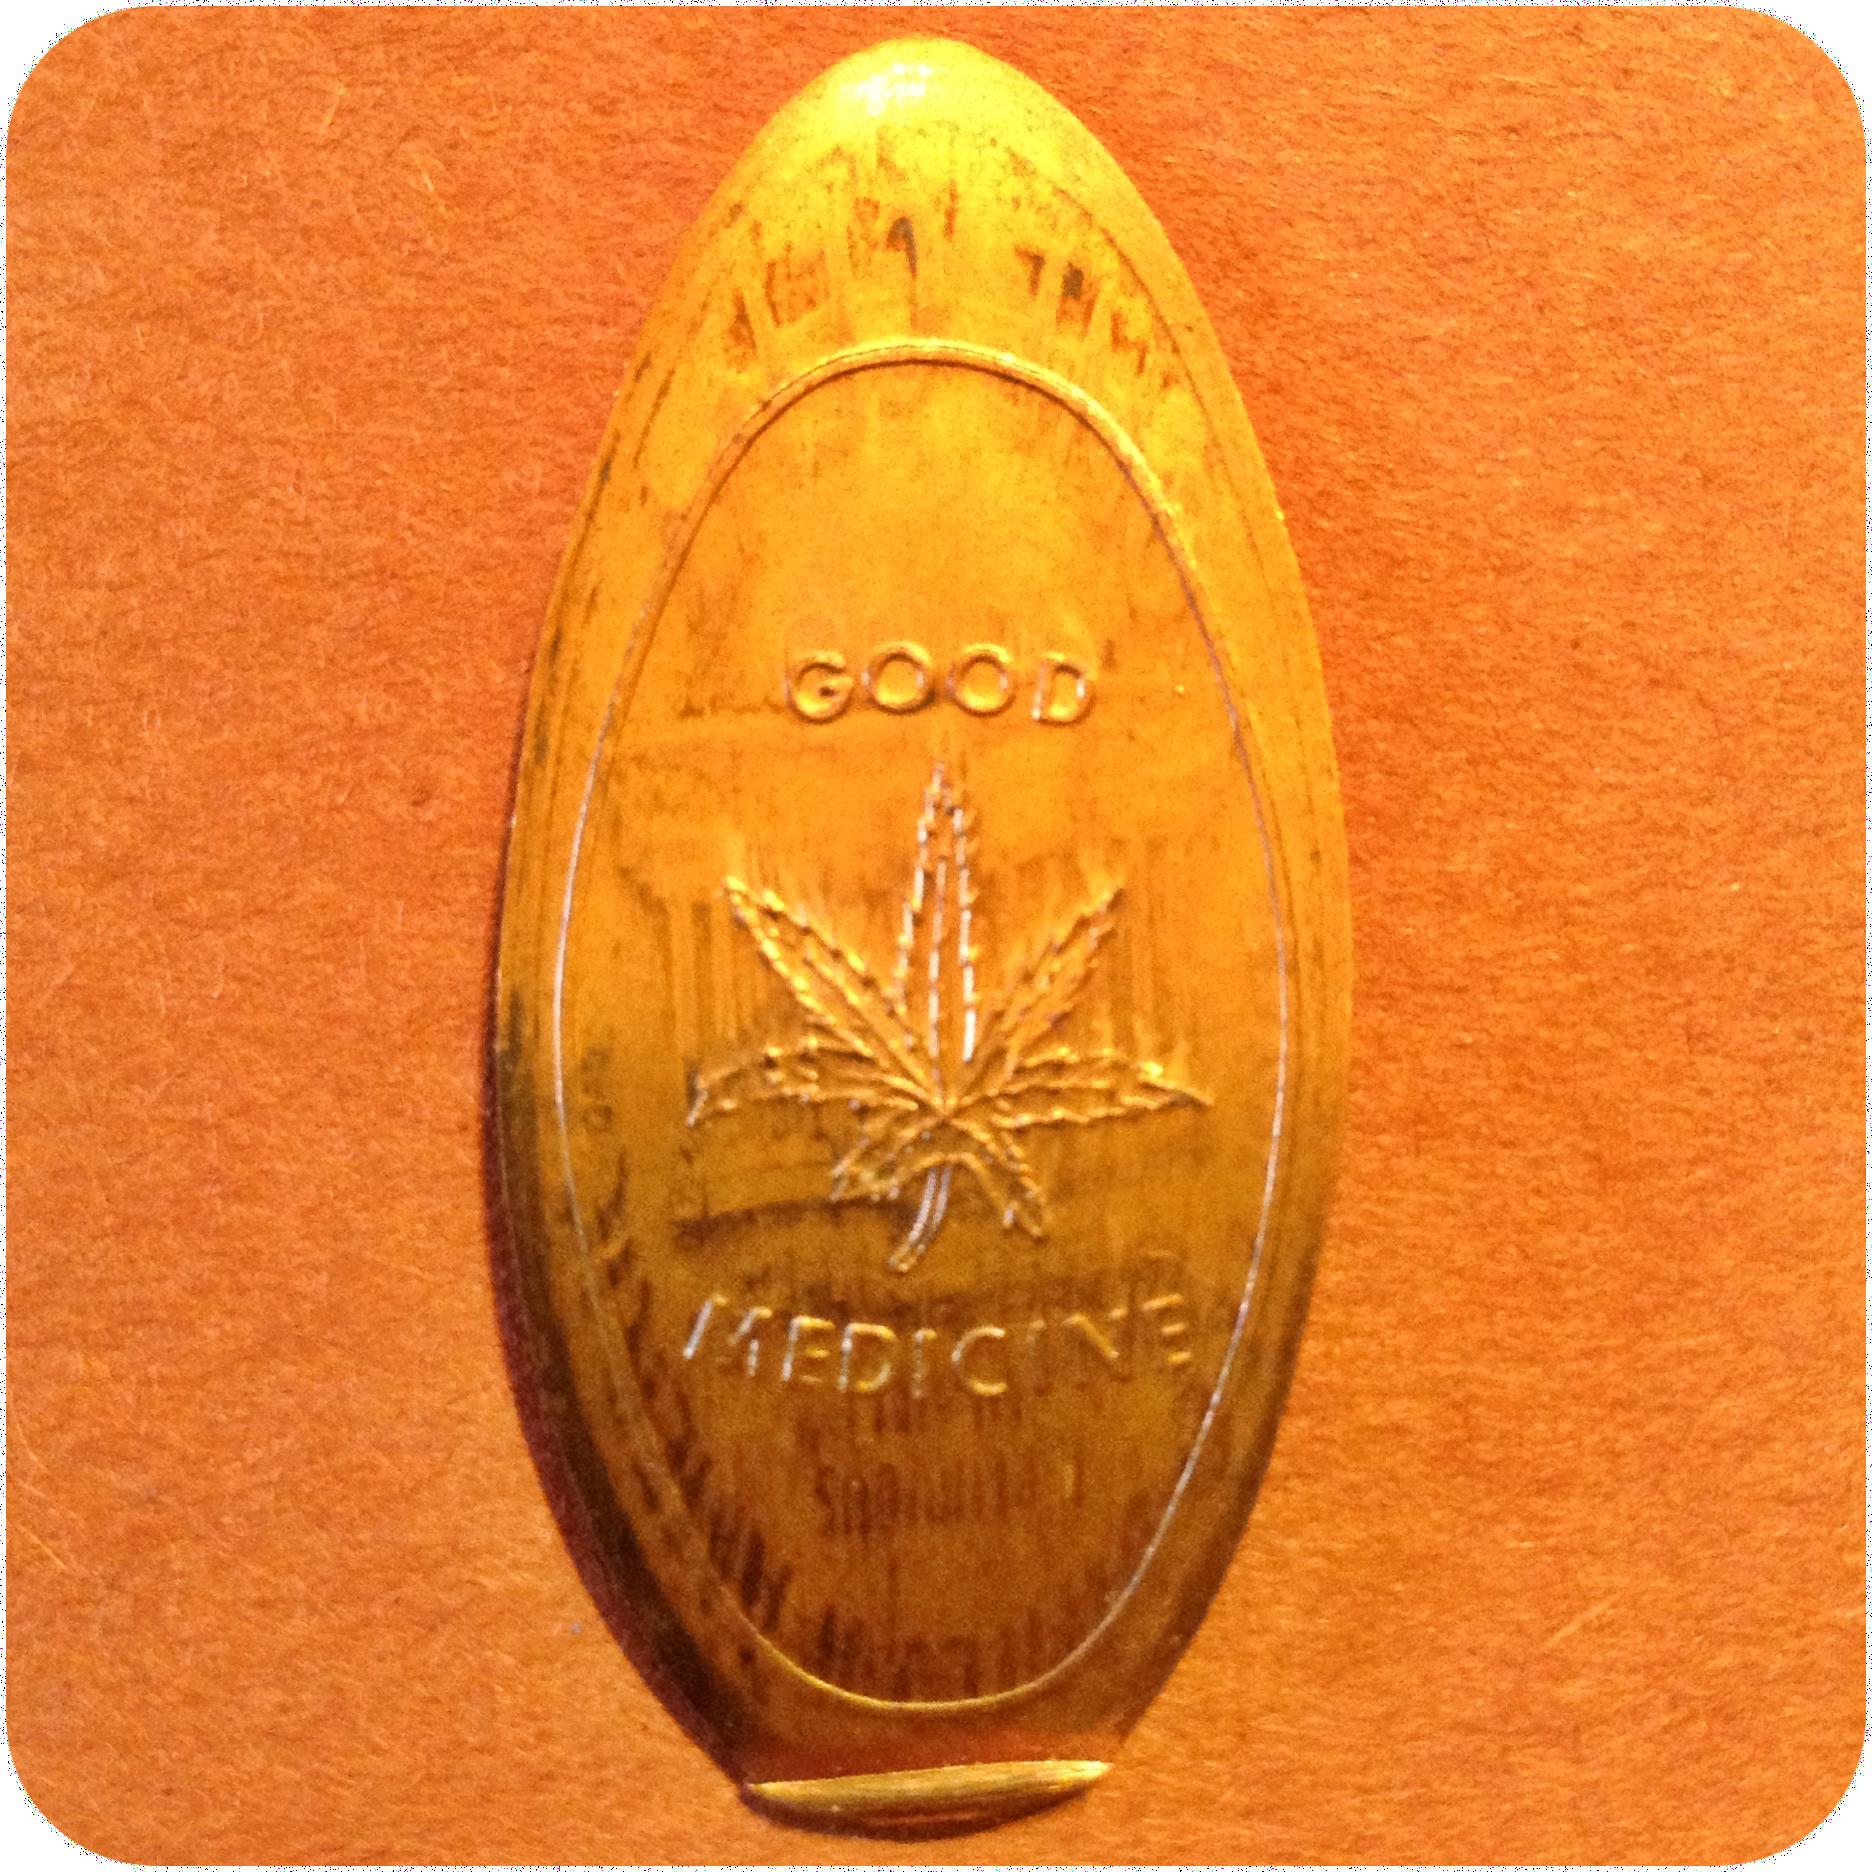 Good Medicine Medical Marijuana Cannabis Weed, Playland Not At The Beach CA Coin